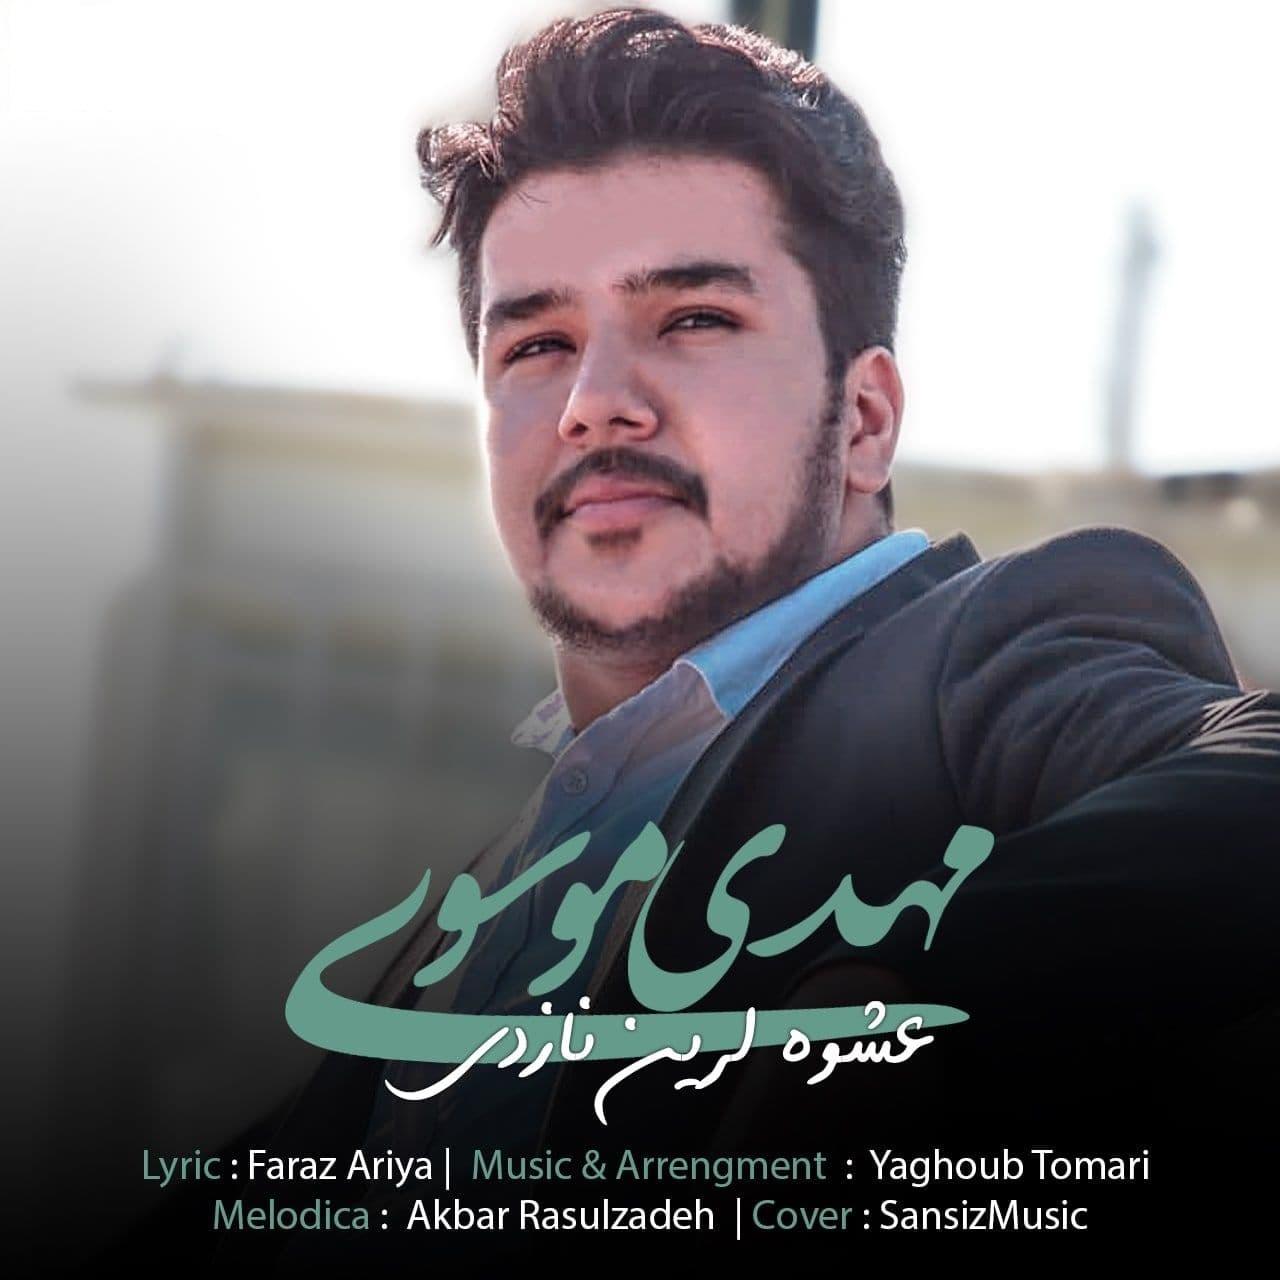 https://s18.picofile.com/file/8433619450/08Mahdi_Mousavi_Eshvalarin_Nazdi.jpg